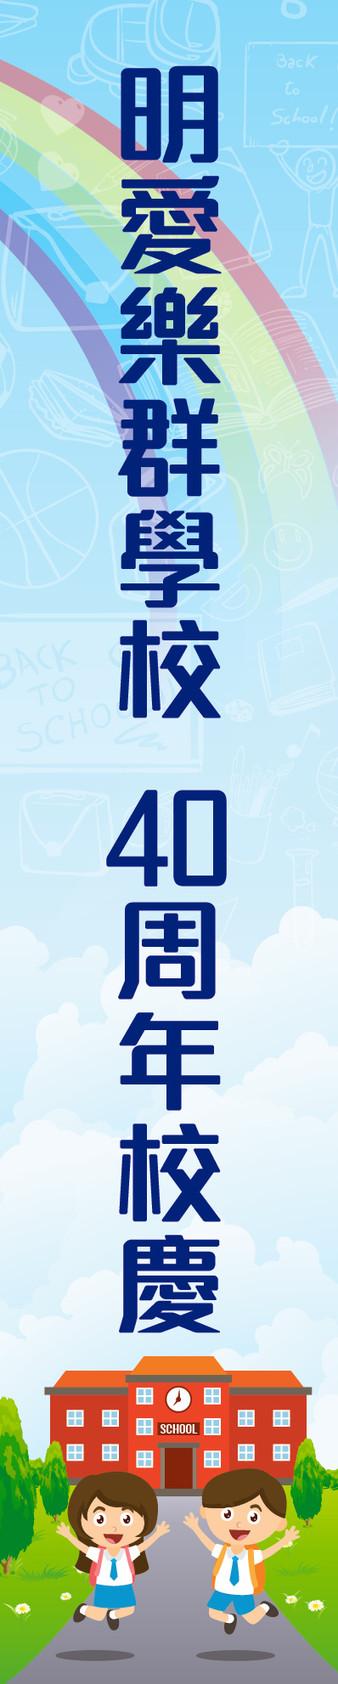 JA1345130_樂群學校_Vinyl_140Wx700cm-02.jpg